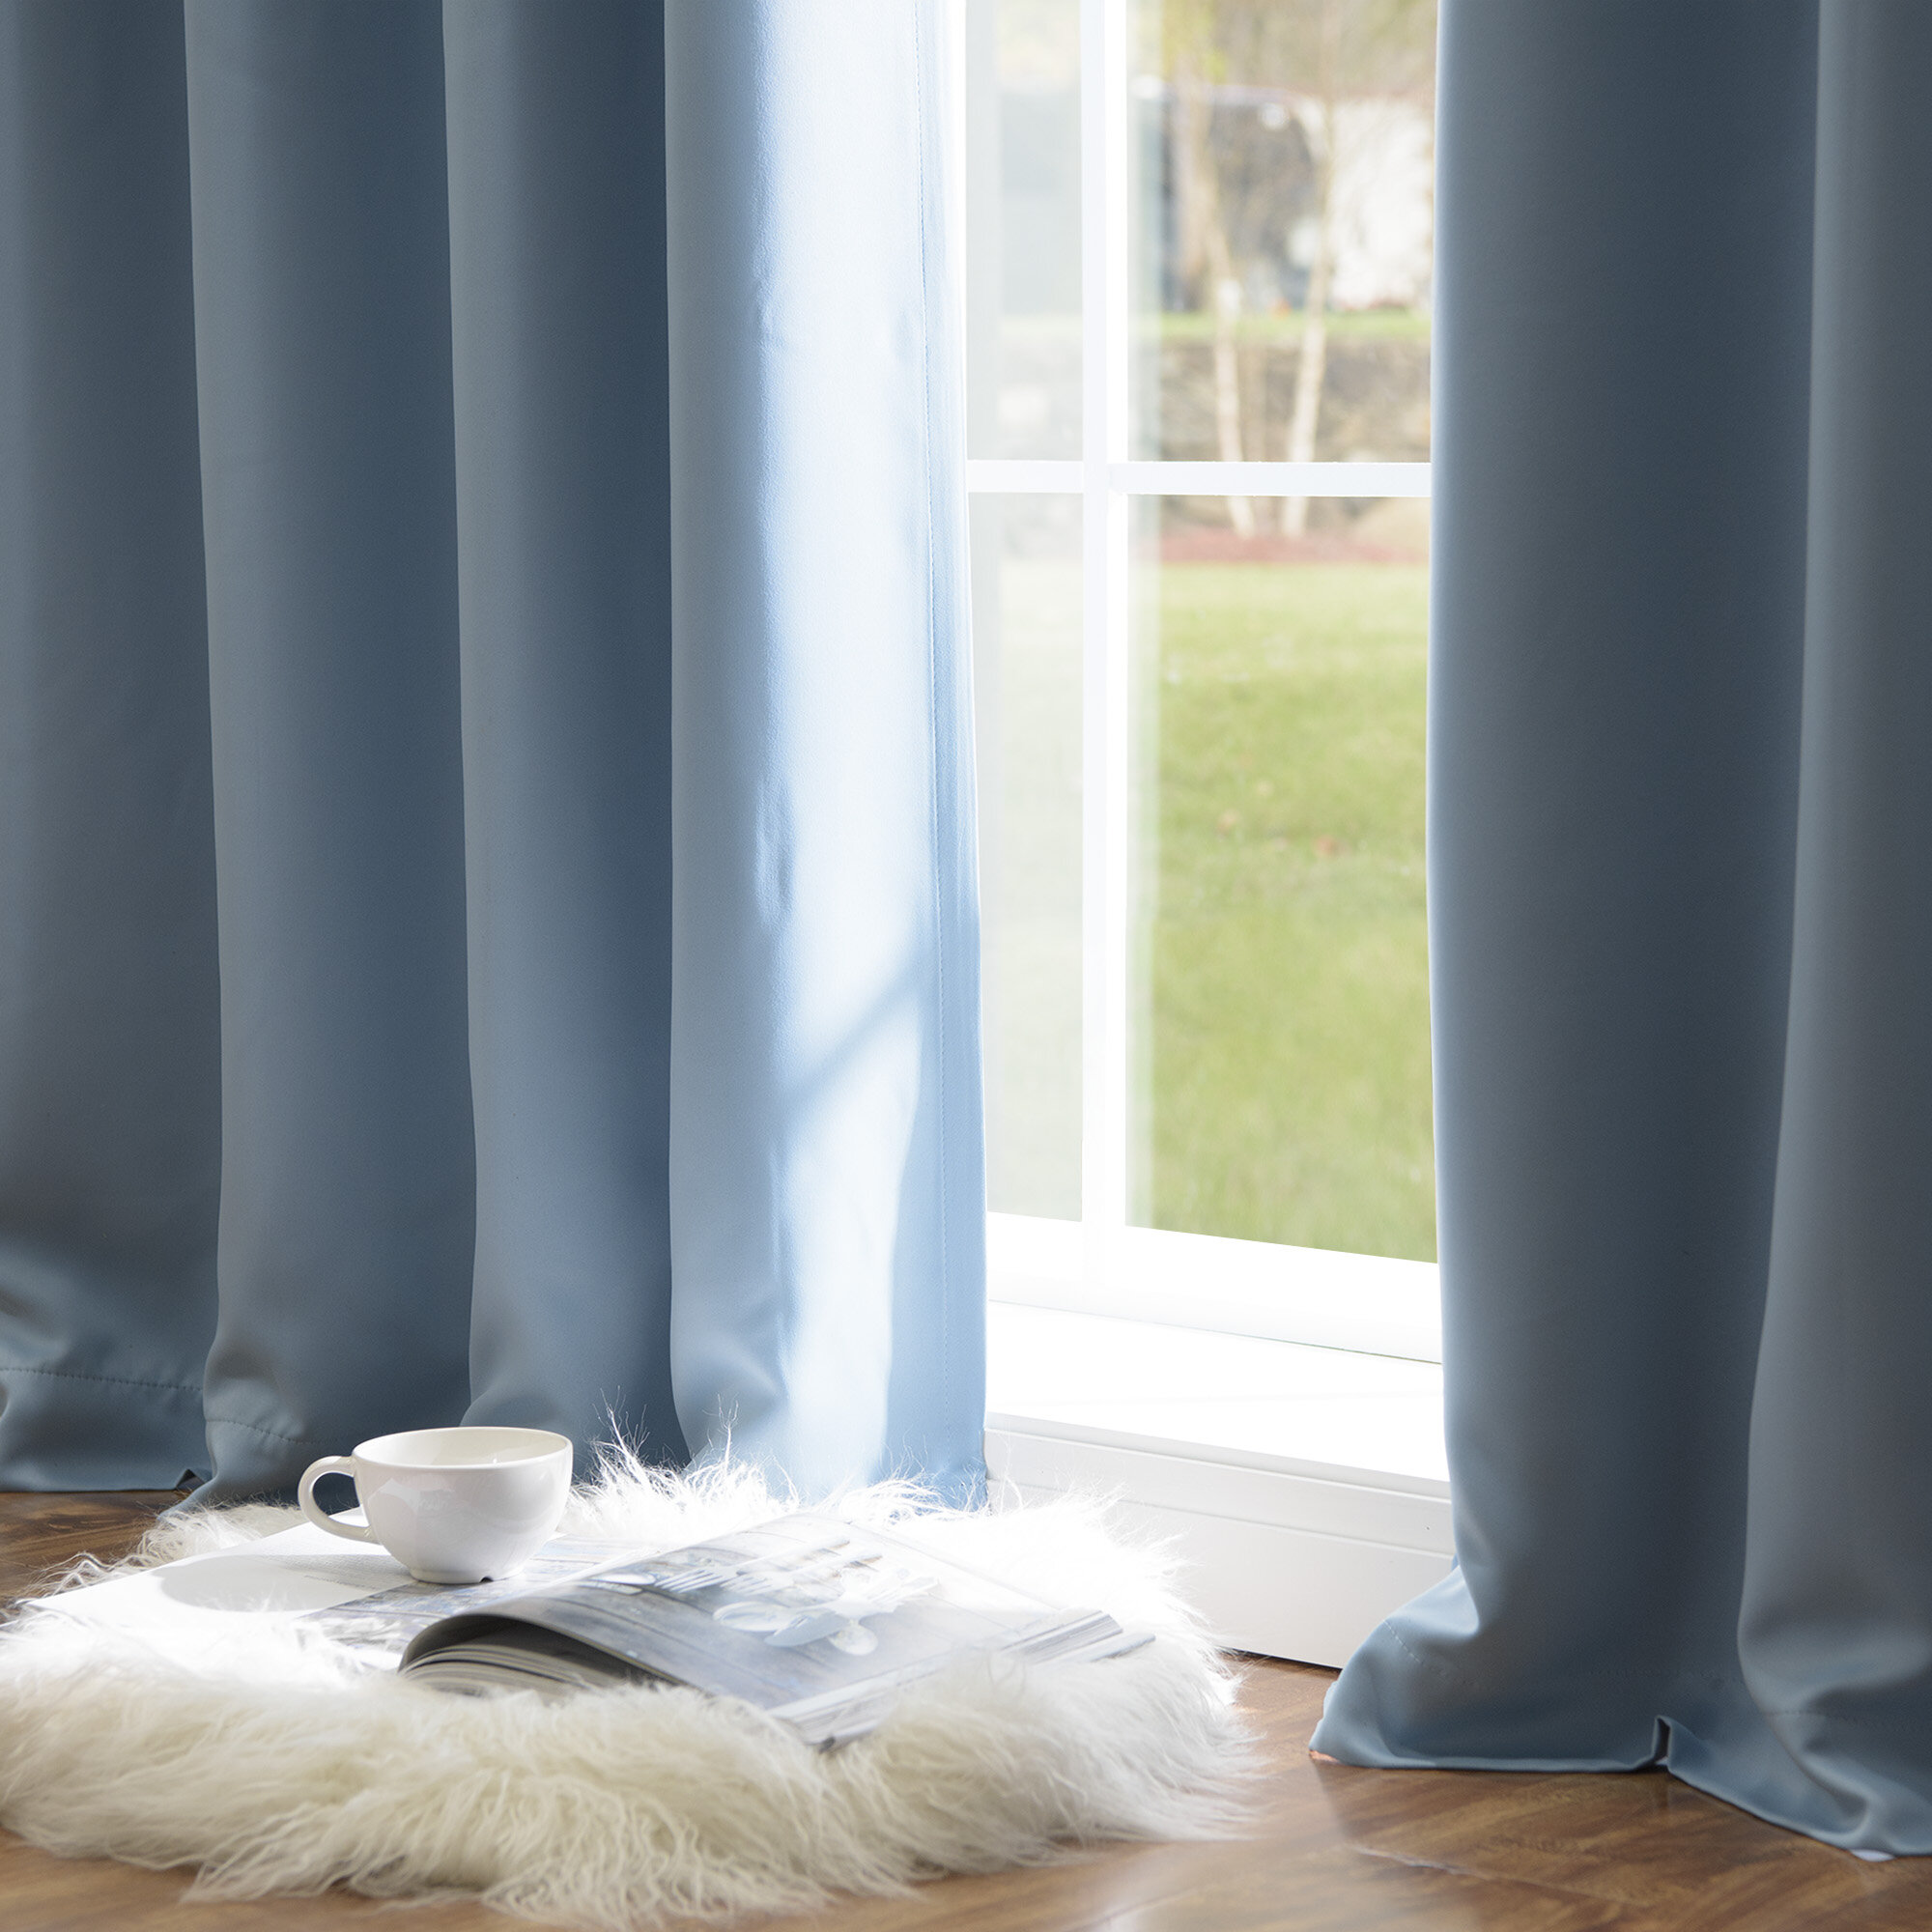 Black & Blue Curtains & Drapes You'll Love in 2021 | Wayfair